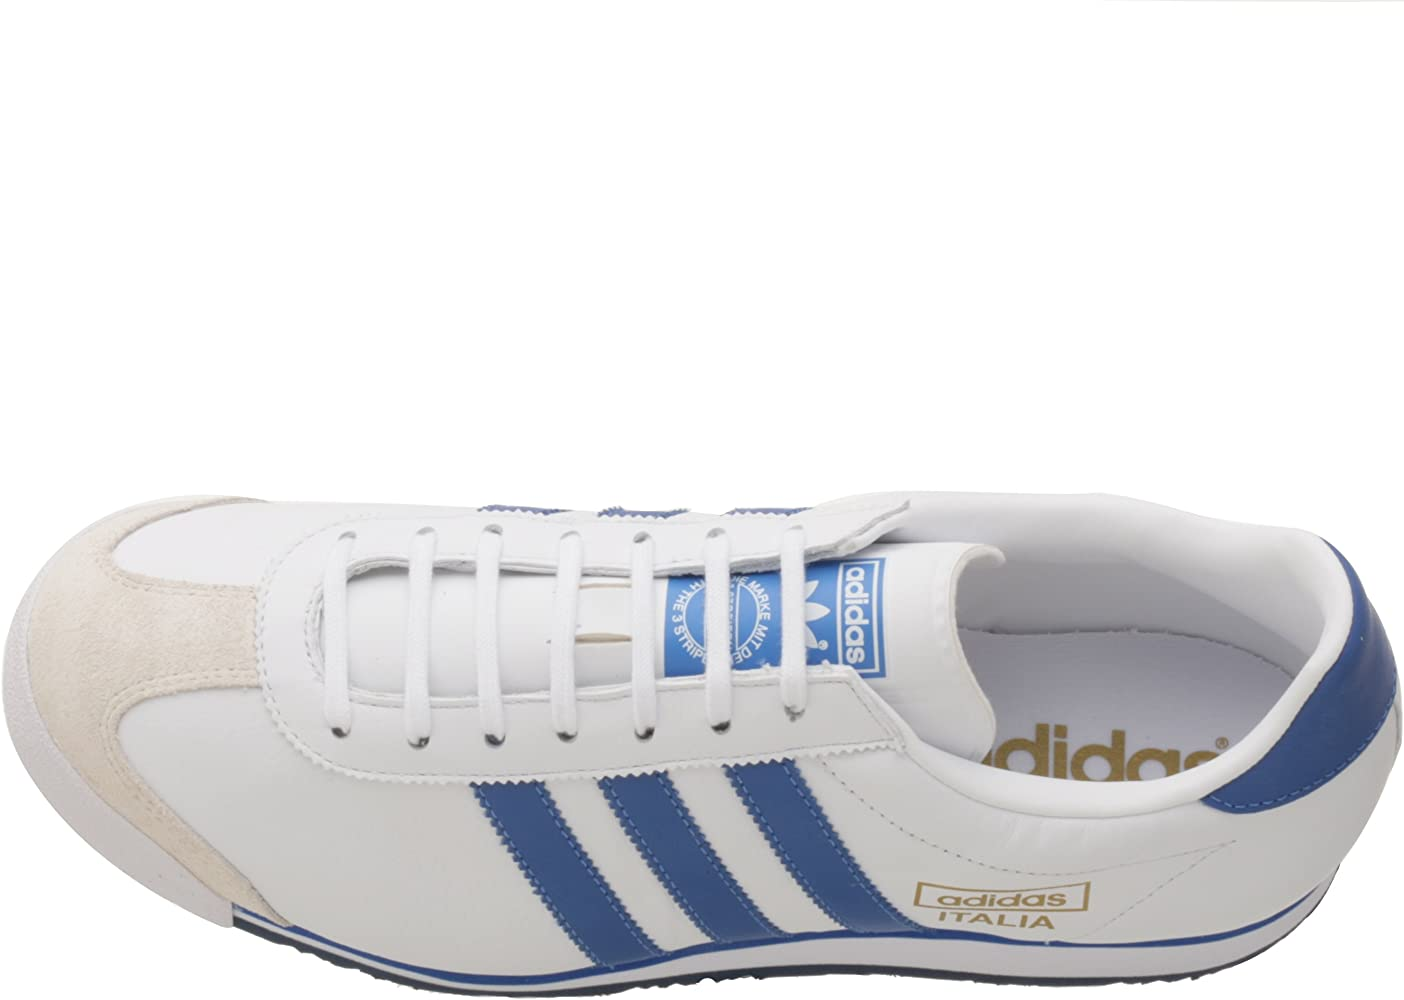 adidas italia 74 trainers